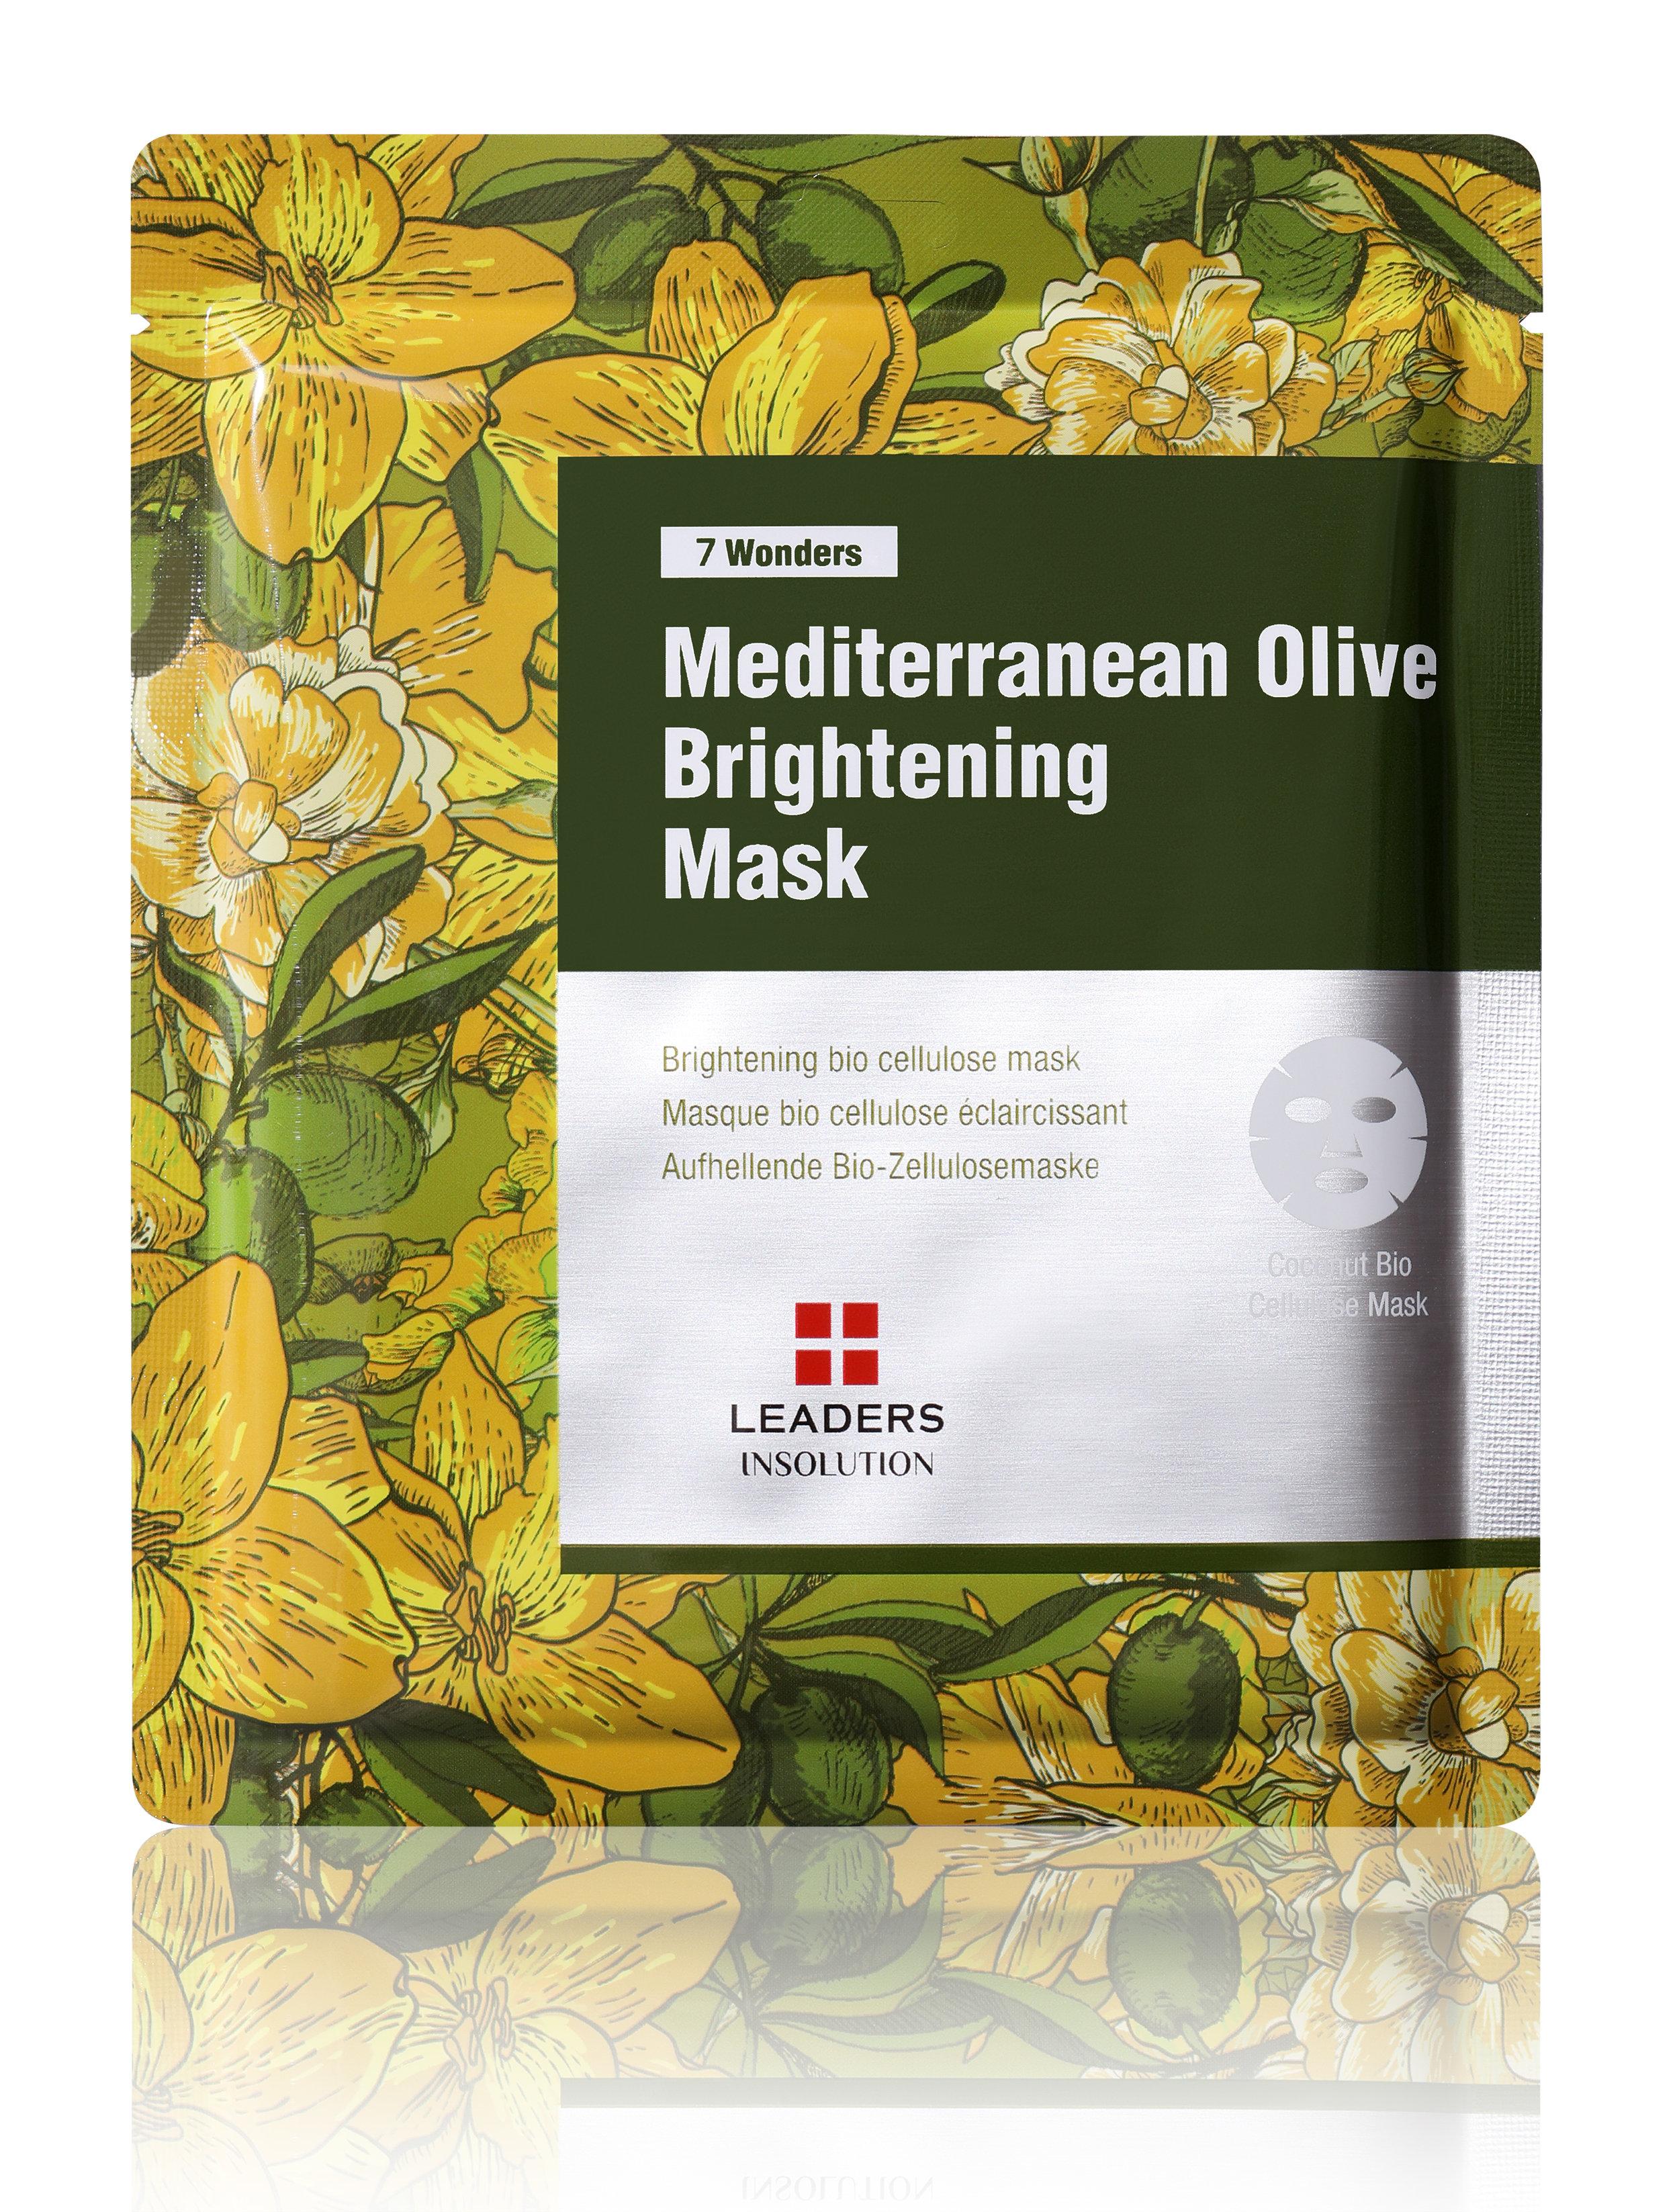 Insolution_7wonders_Mediterranean olive_UNI_파우치_전면.jpg